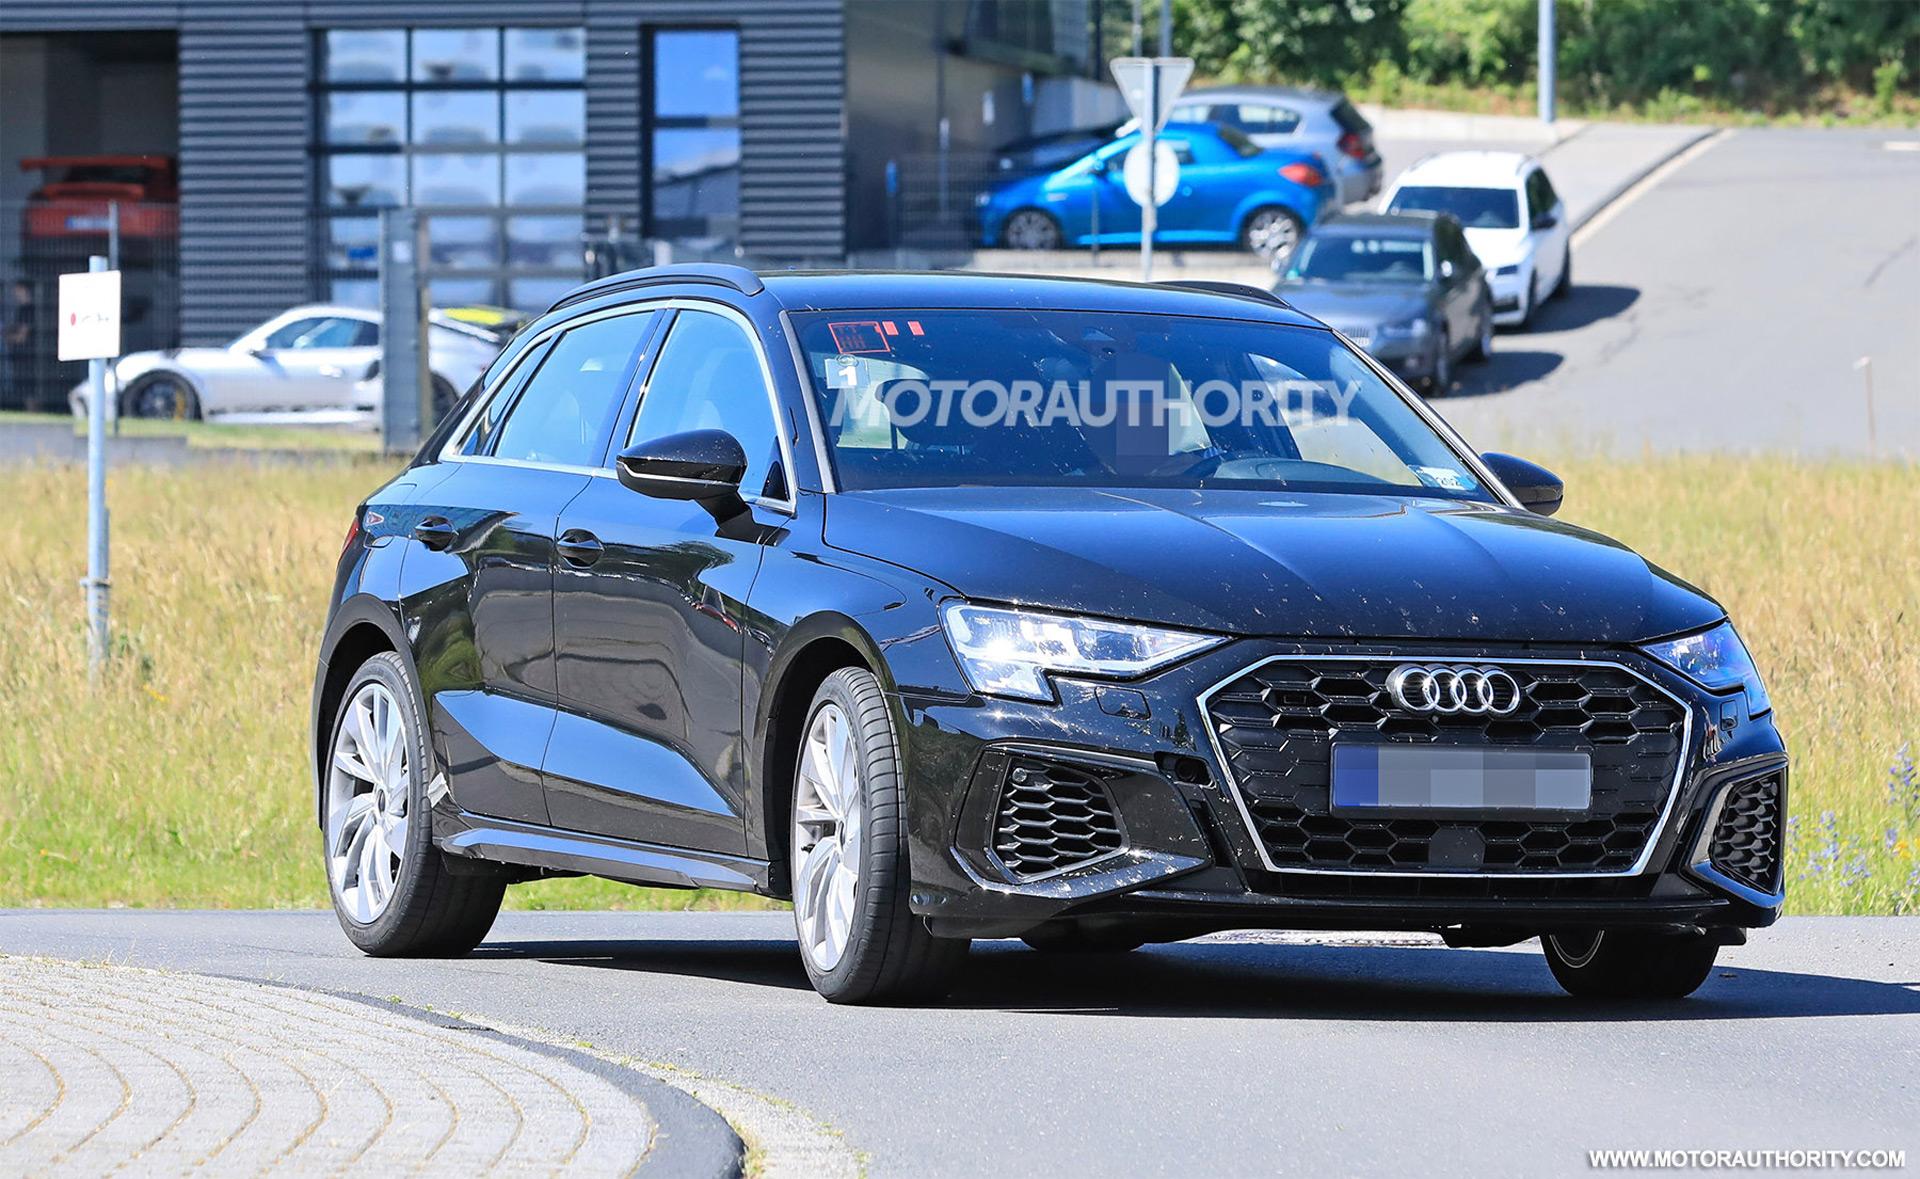 Kelebihan Audi A3 S3 Murah Berkualitas